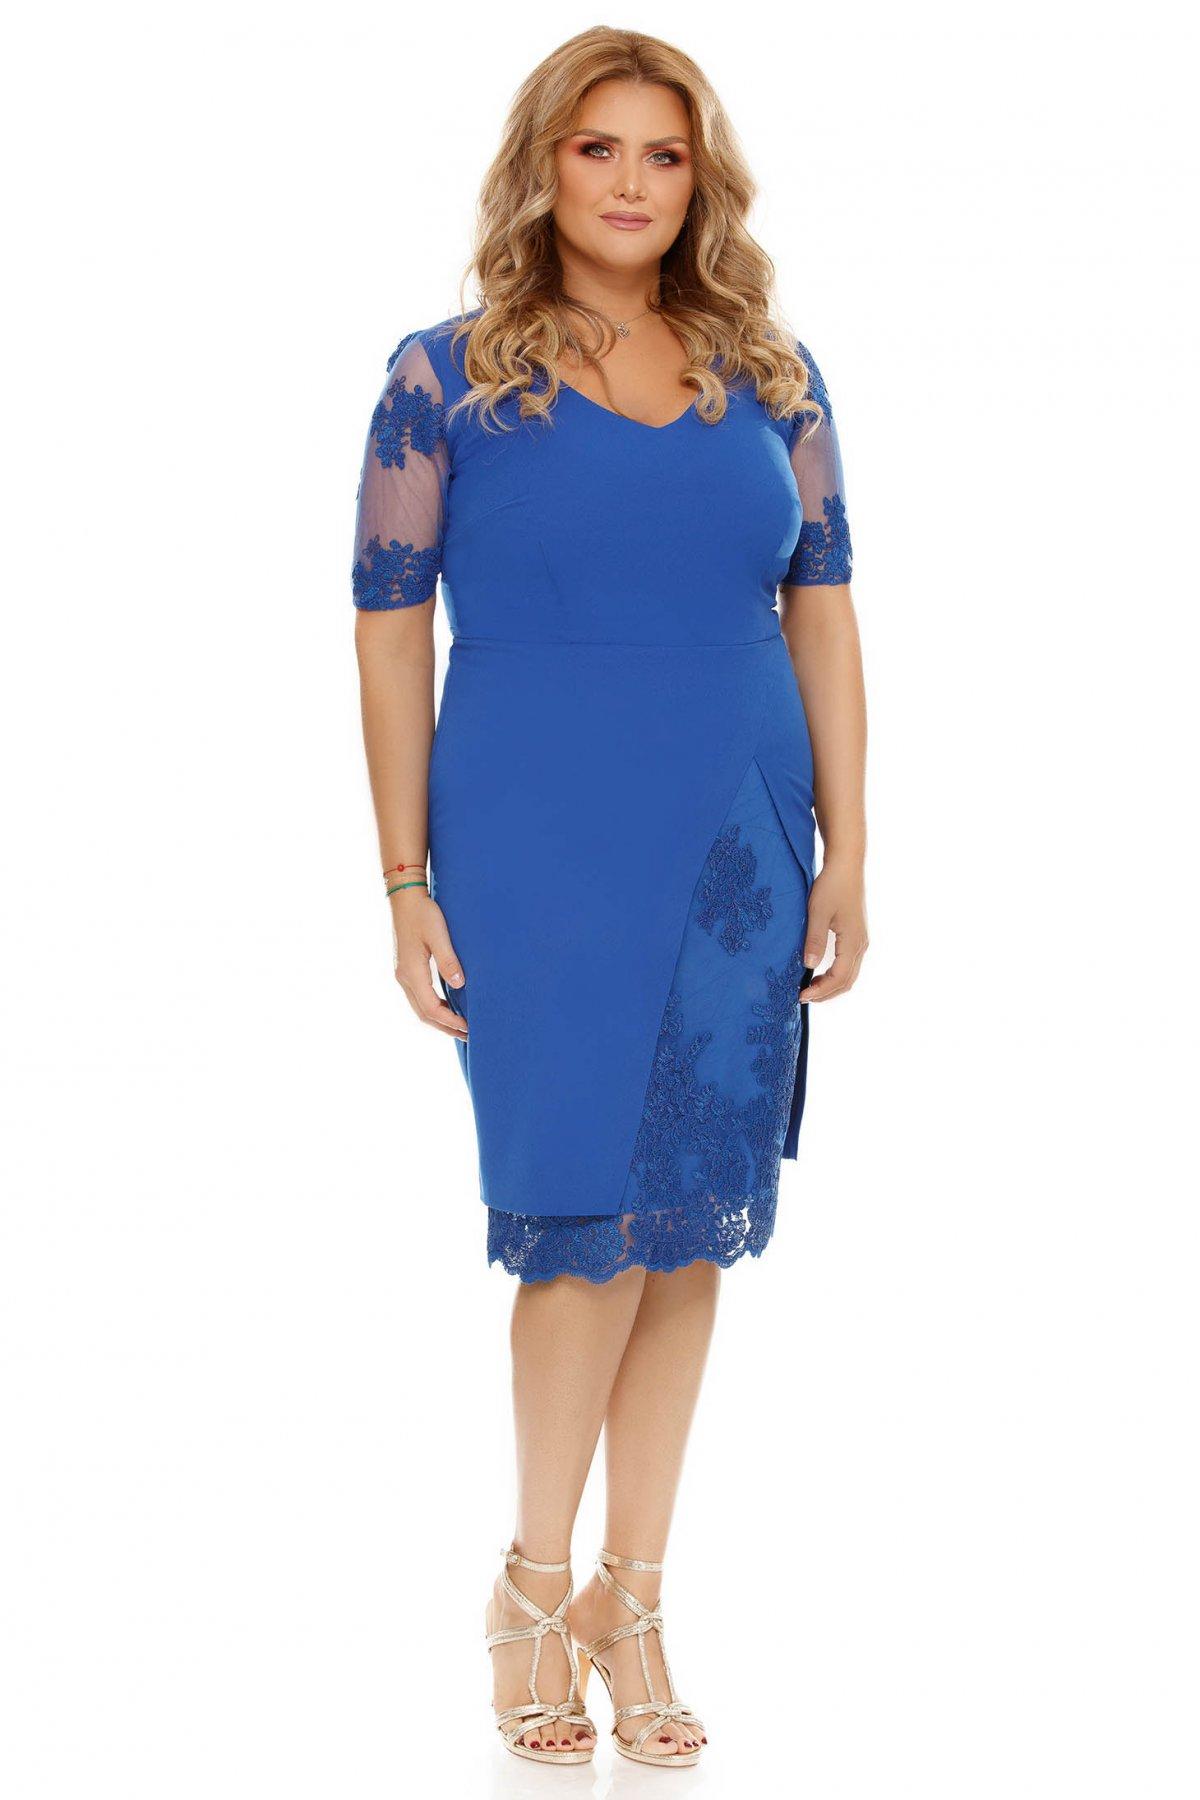 Rochie albastra de ocazie cu un croi mulat cu aplicatii de dantela din stofa usor elastica